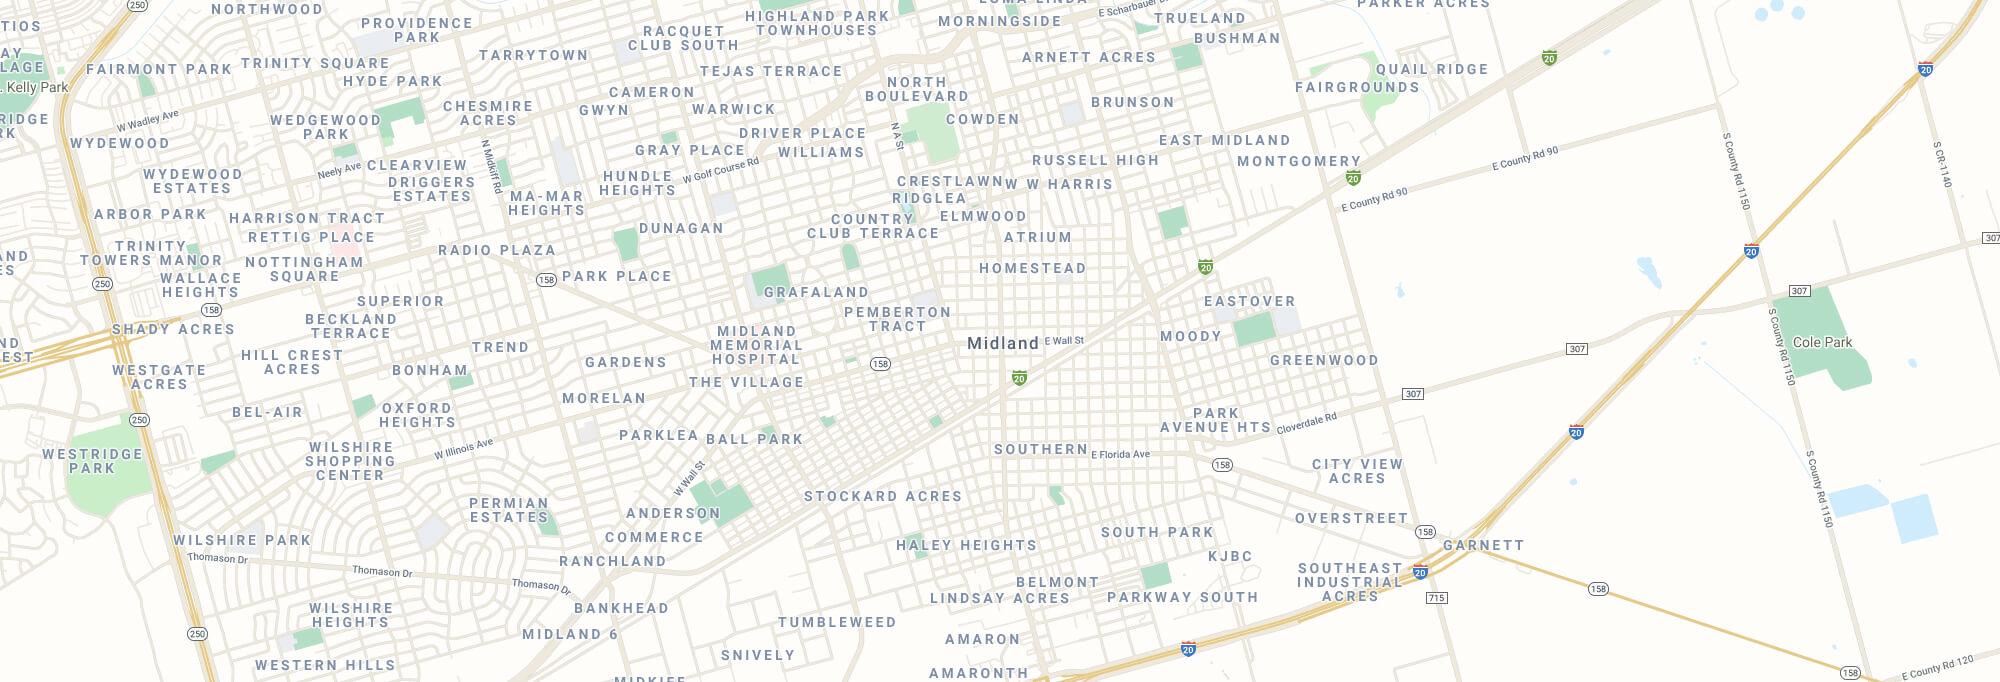 Midland city map